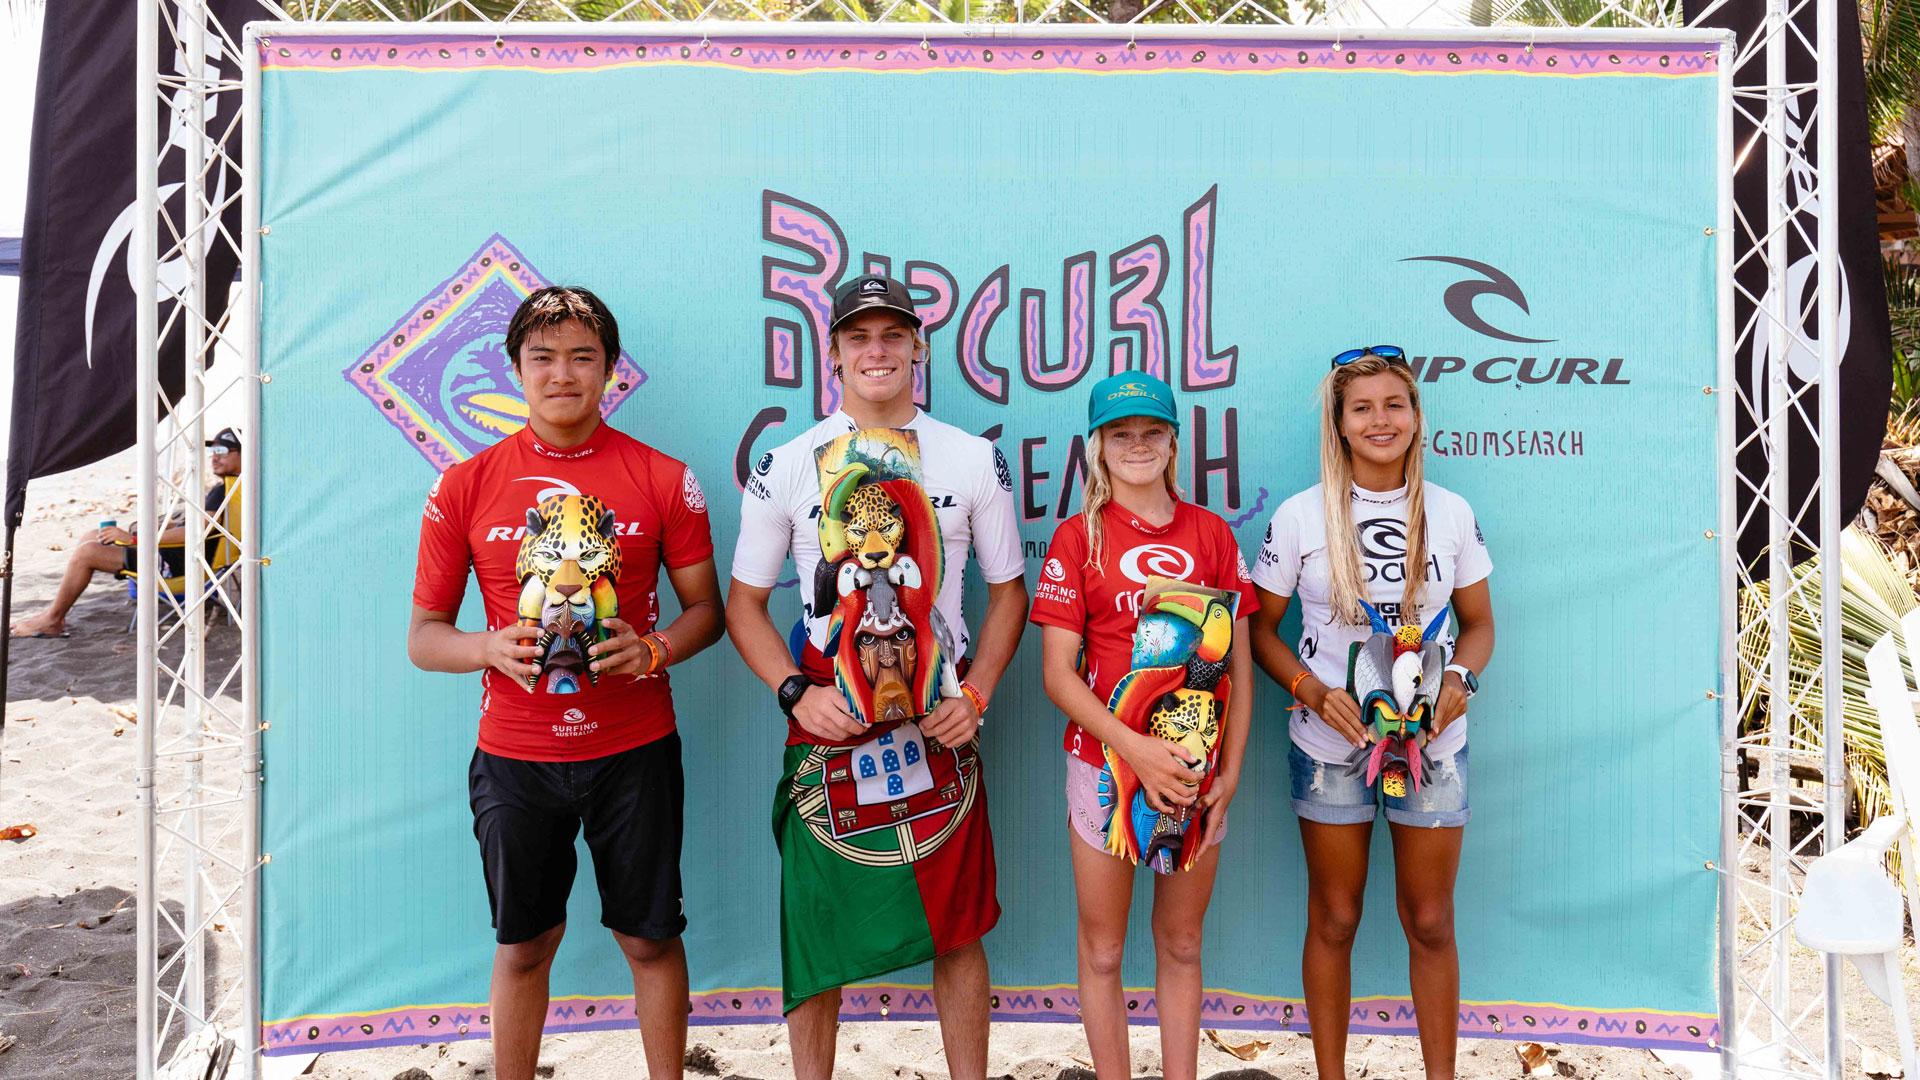 Day 3: Rip Curl GromSearch International Final Playa Hermosa, Costa Rica